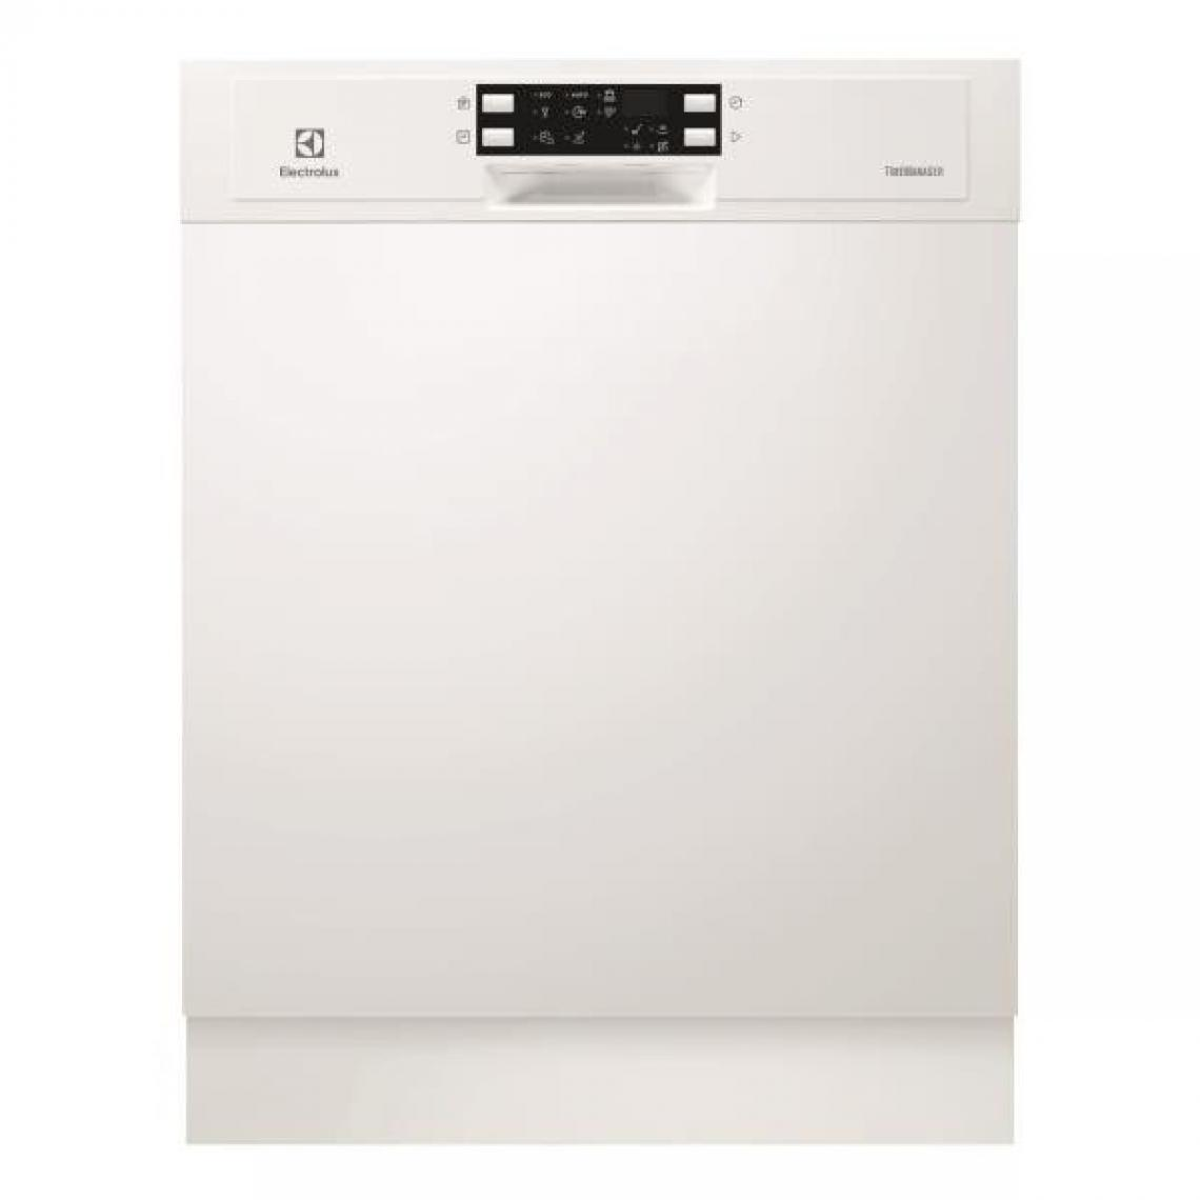 Electrolux electrolux - esi5543low